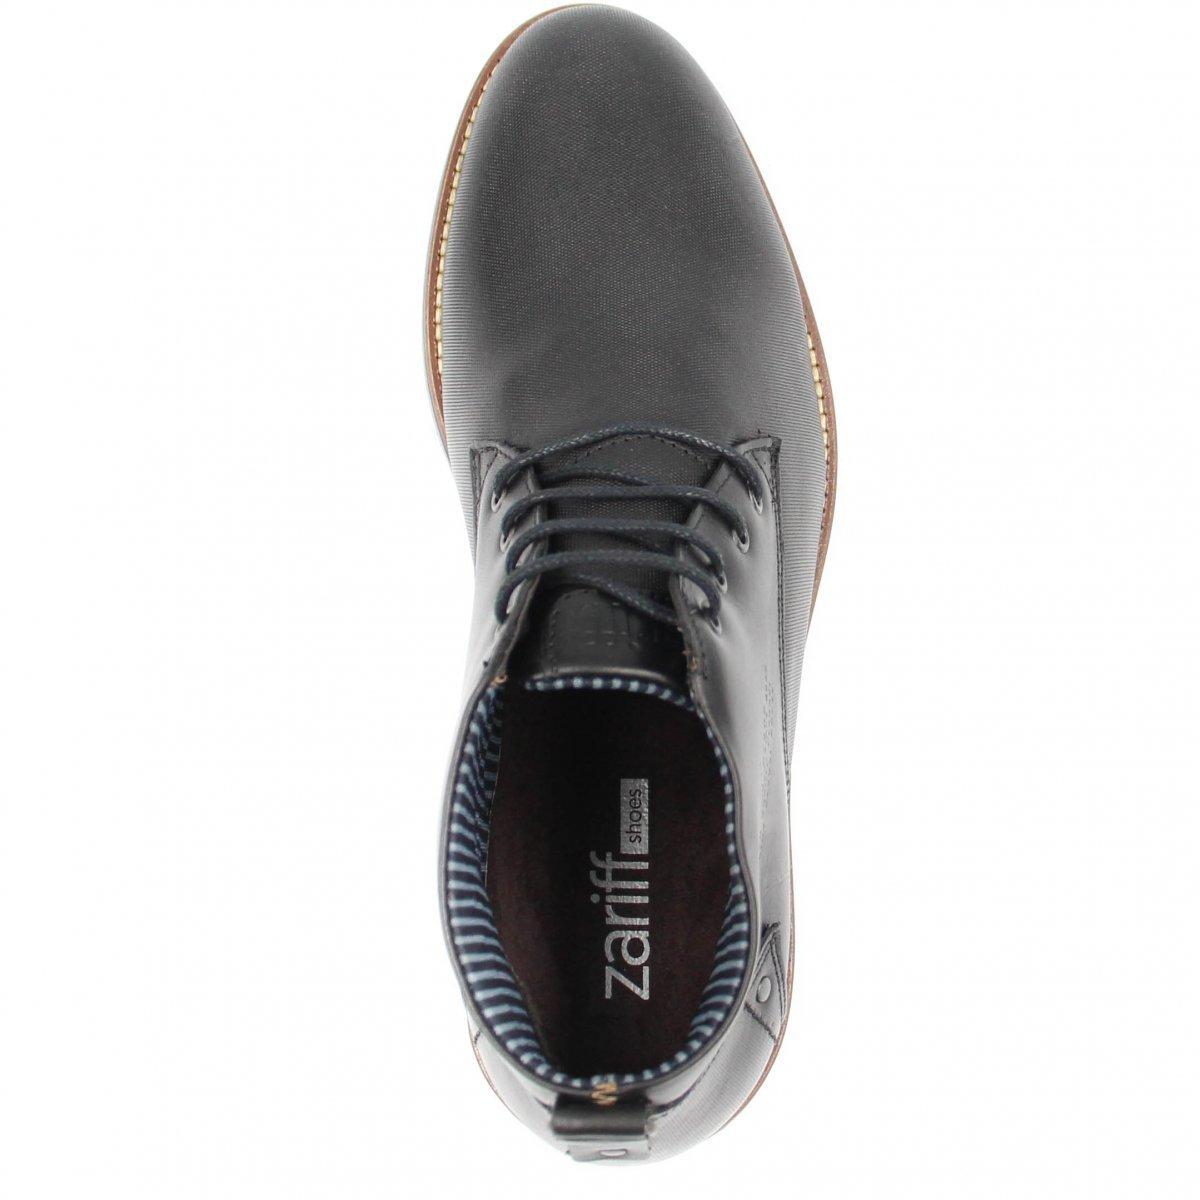 Cadarço em Shoes Masculina Zariff Preto Couro Bota Social Bota Zariff wUgqn0fgT